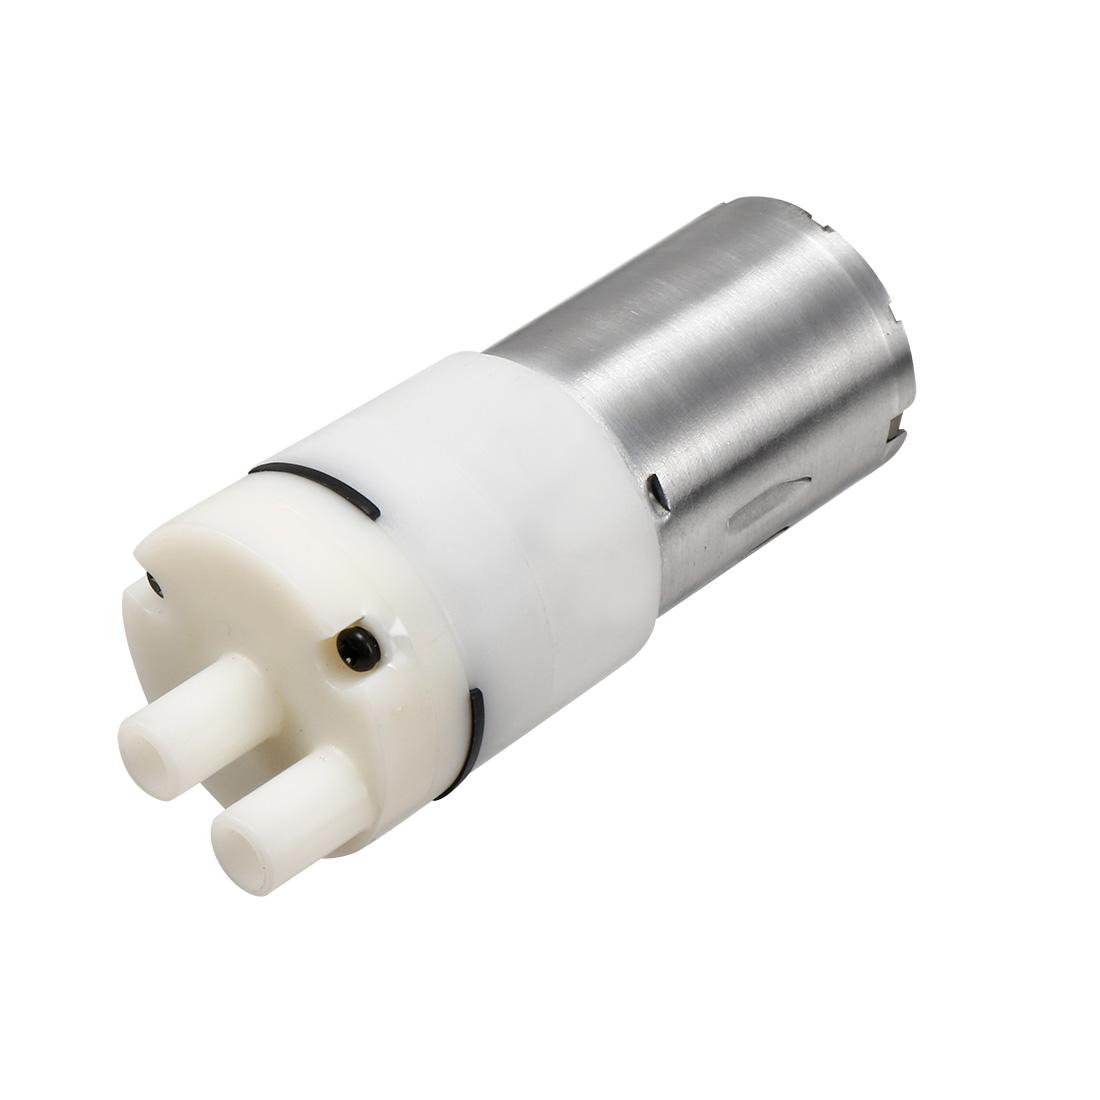 DC 24V 1200ml Air Pump Motor for Aquarium Tank Oxygen Circulate